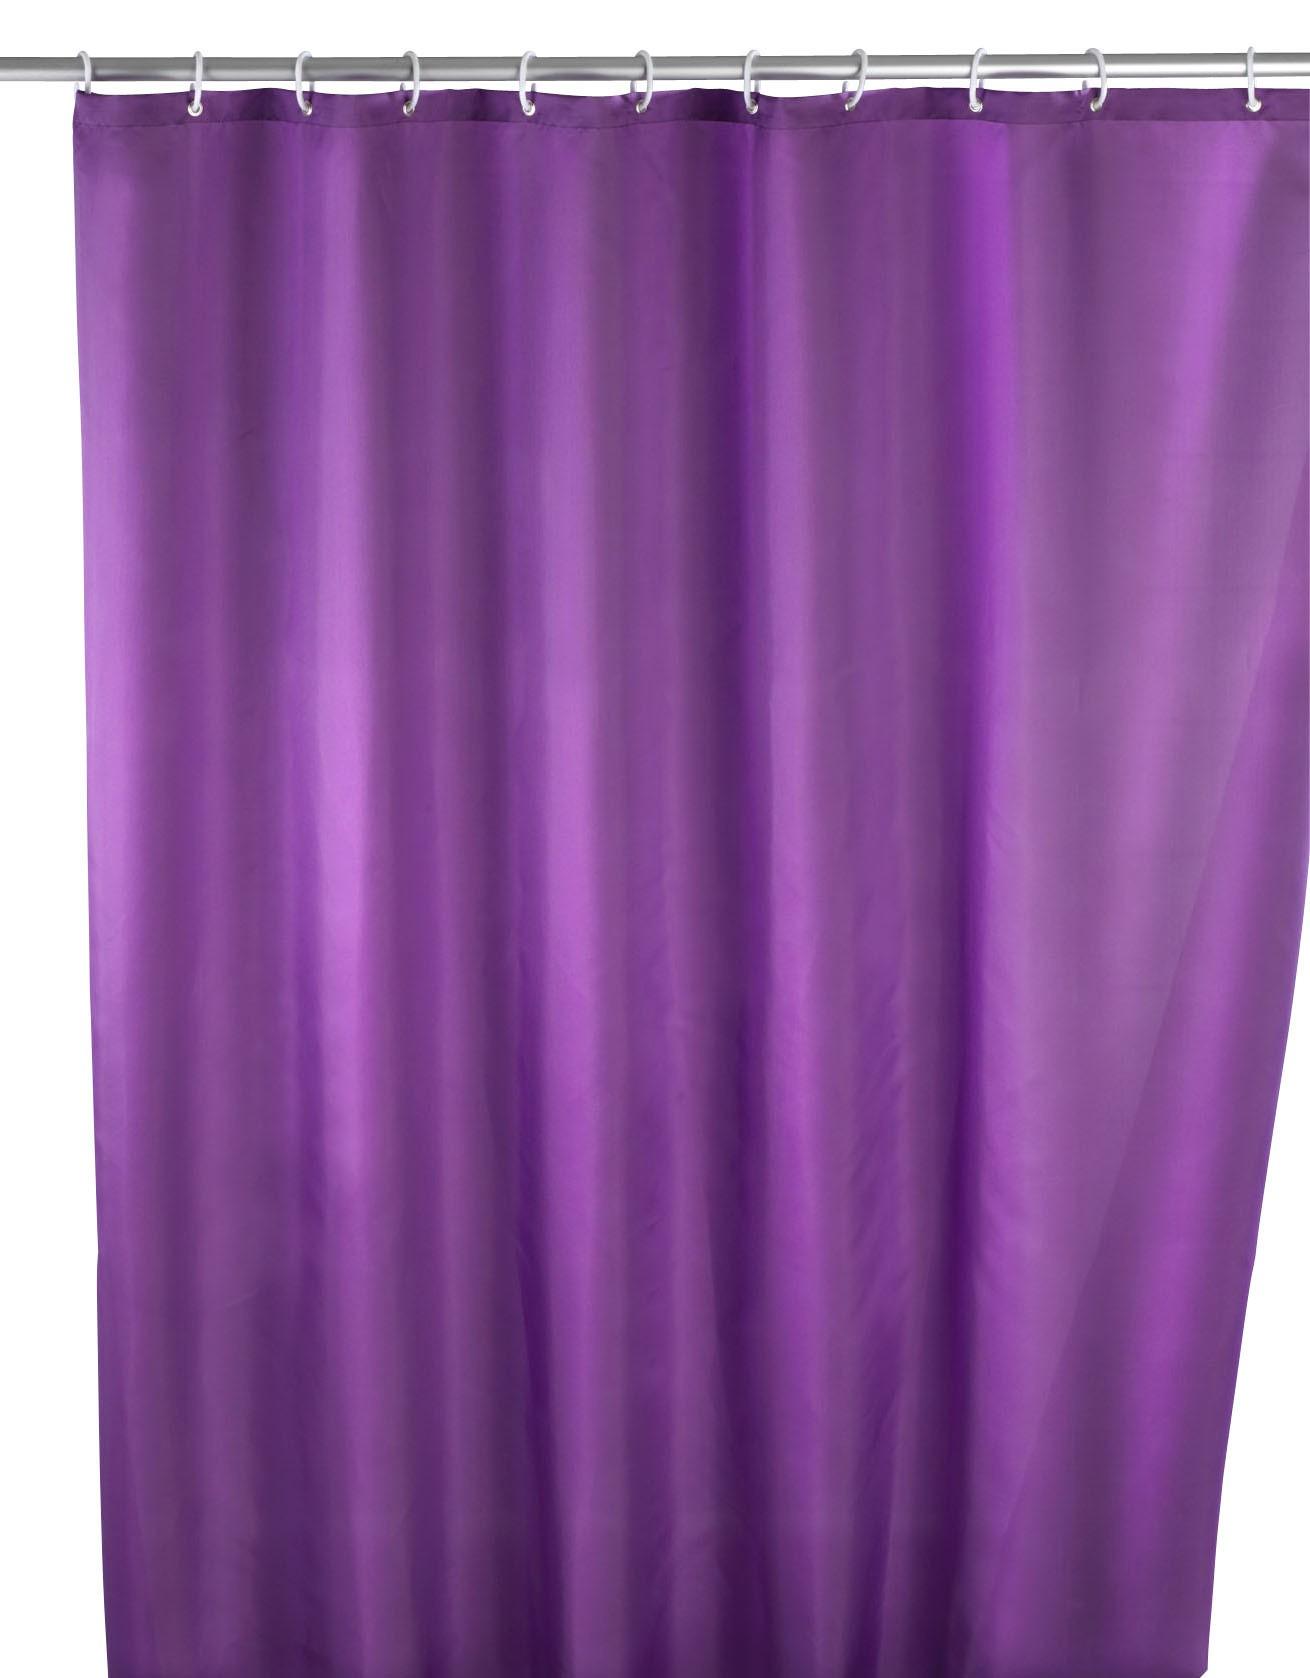 Anti-Schimmel Duschvorhang Uni Purple, 180 x 200 cm, waschbar